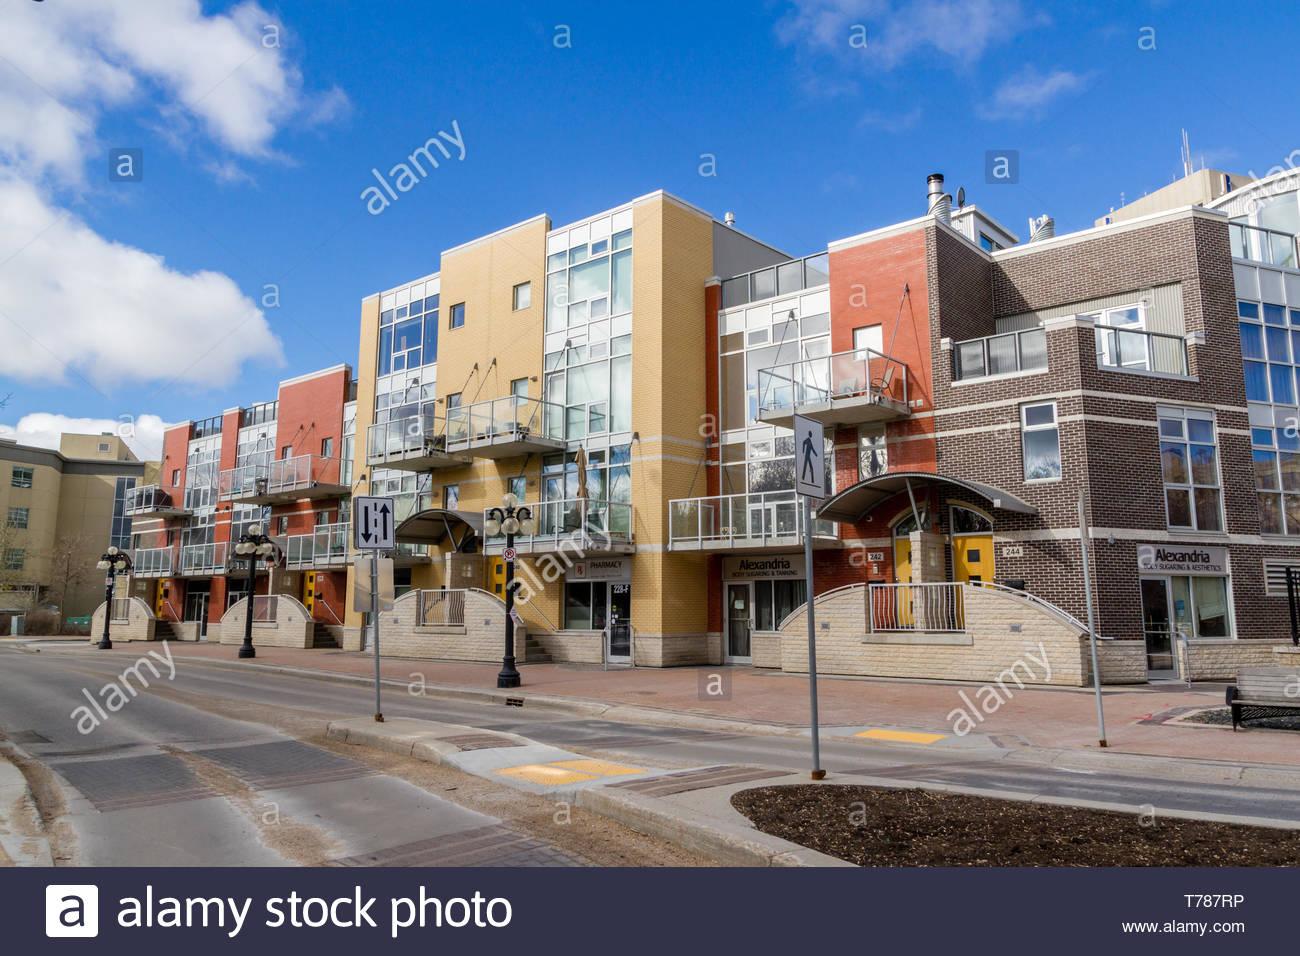 Artsy apartments or condominiums in Winnipeg Manitoba's exchange district. - Stock Image